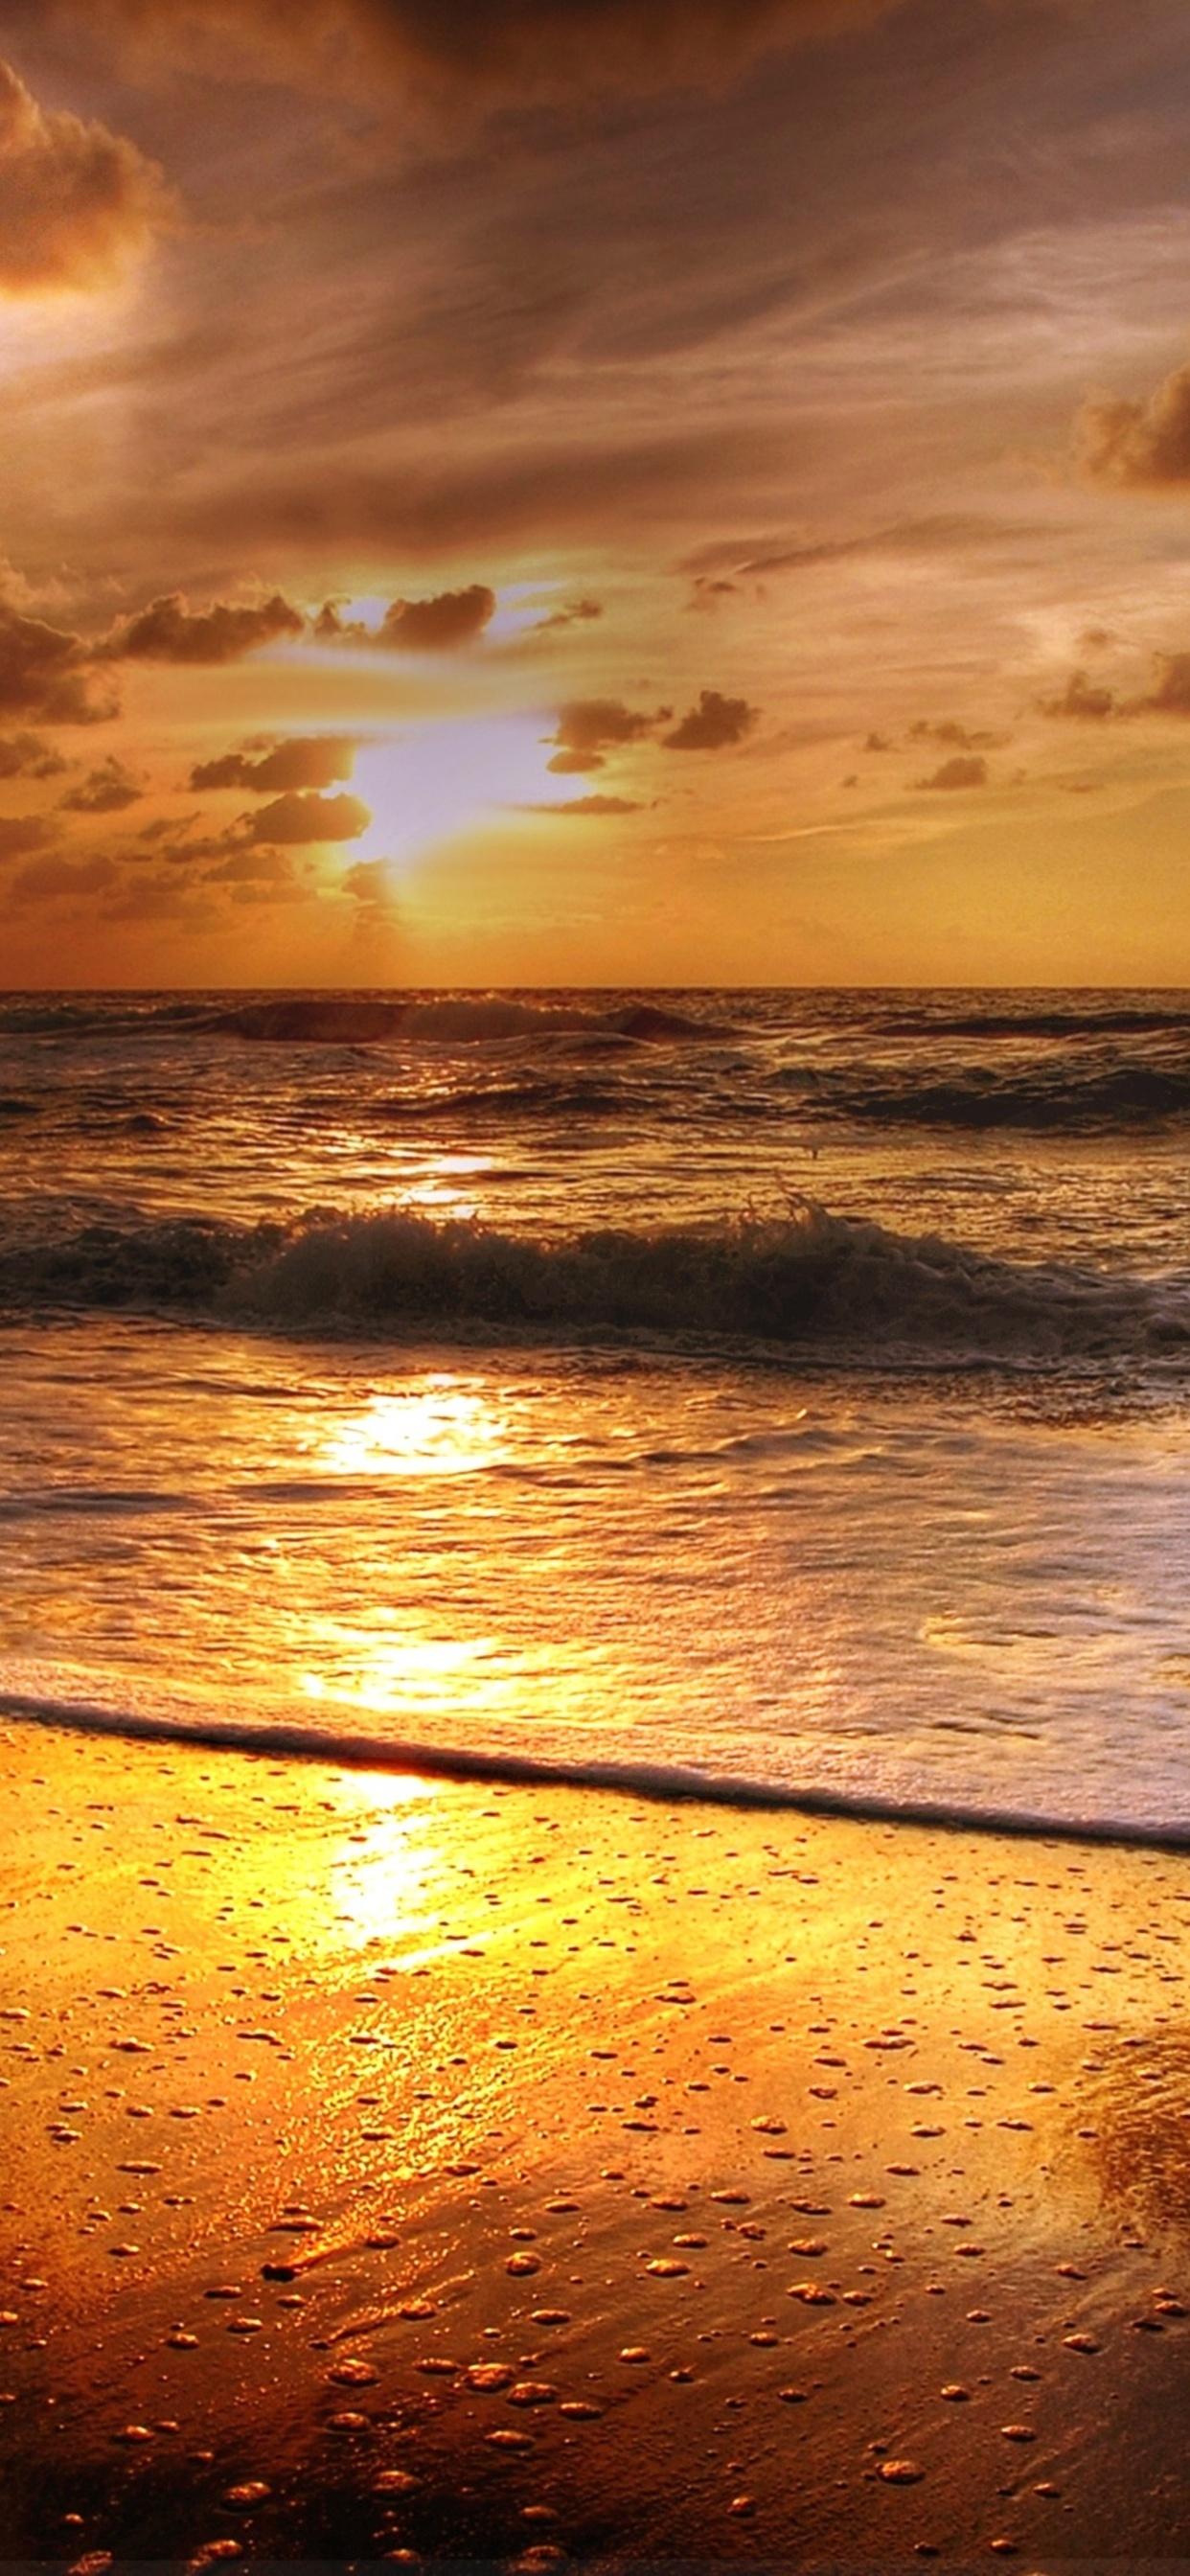 Iphone Xs Max Wallpaper Sunset